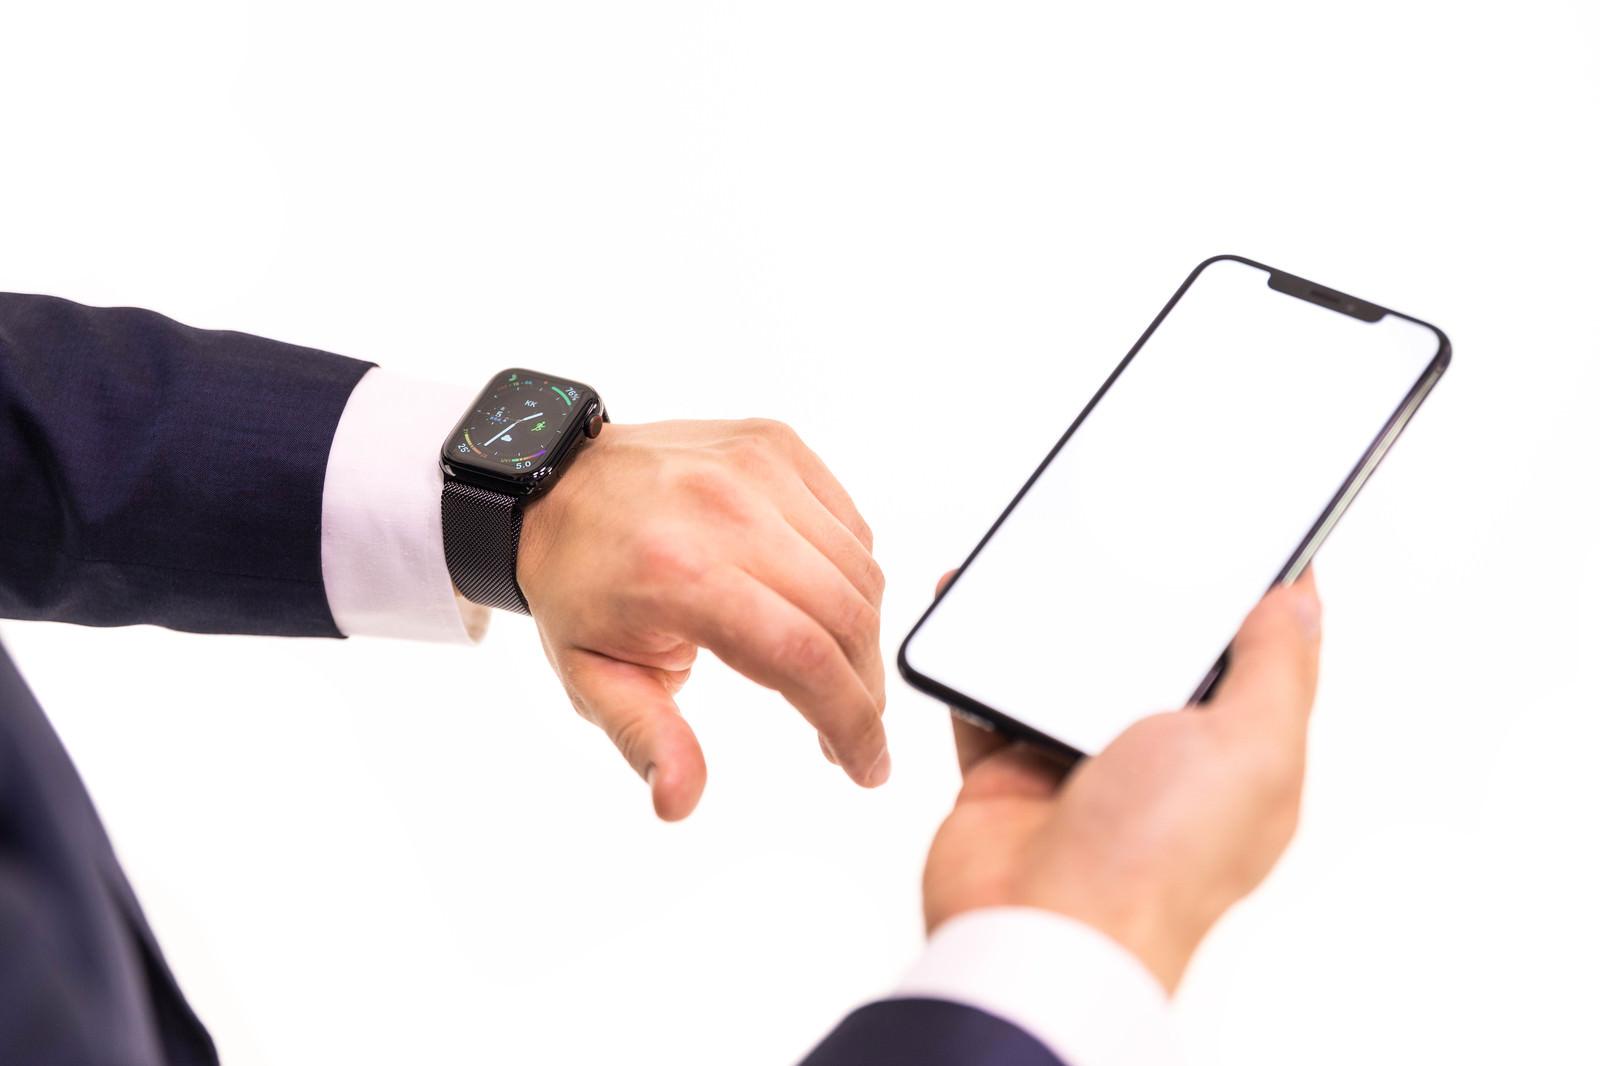 「Apple Watch Series 4 と iPhone XS を使う手元」の写真